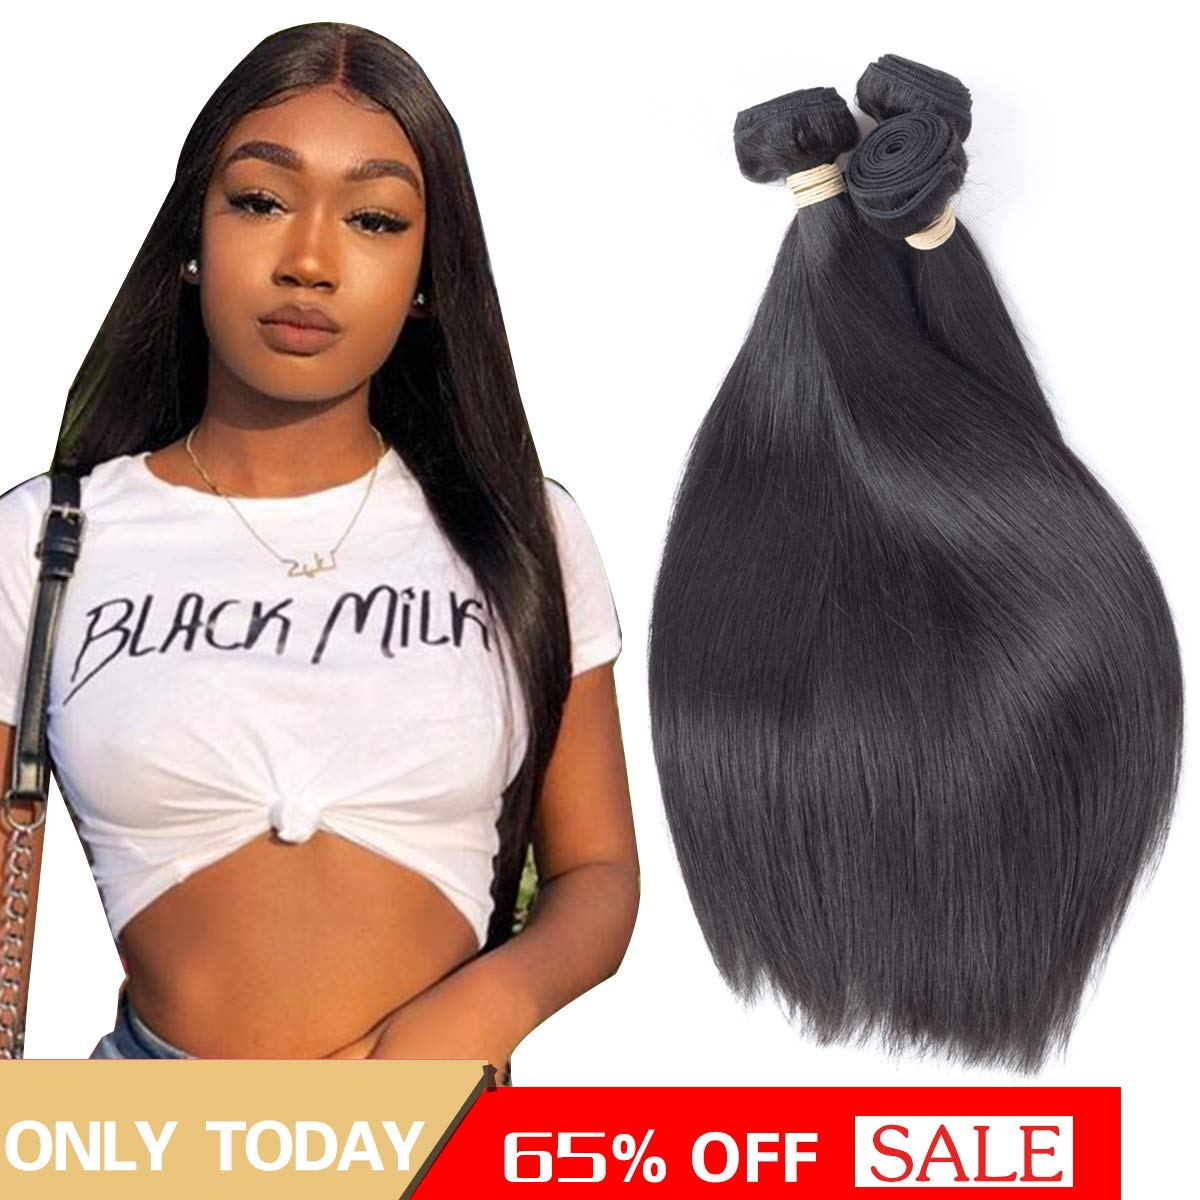 Beauhair Brazilian Straight Hair 3 Bundles 20 22 24inch Grade 8A Virgin Straight Human Hair Bundles Natural Black Color Hair Weave Extentions